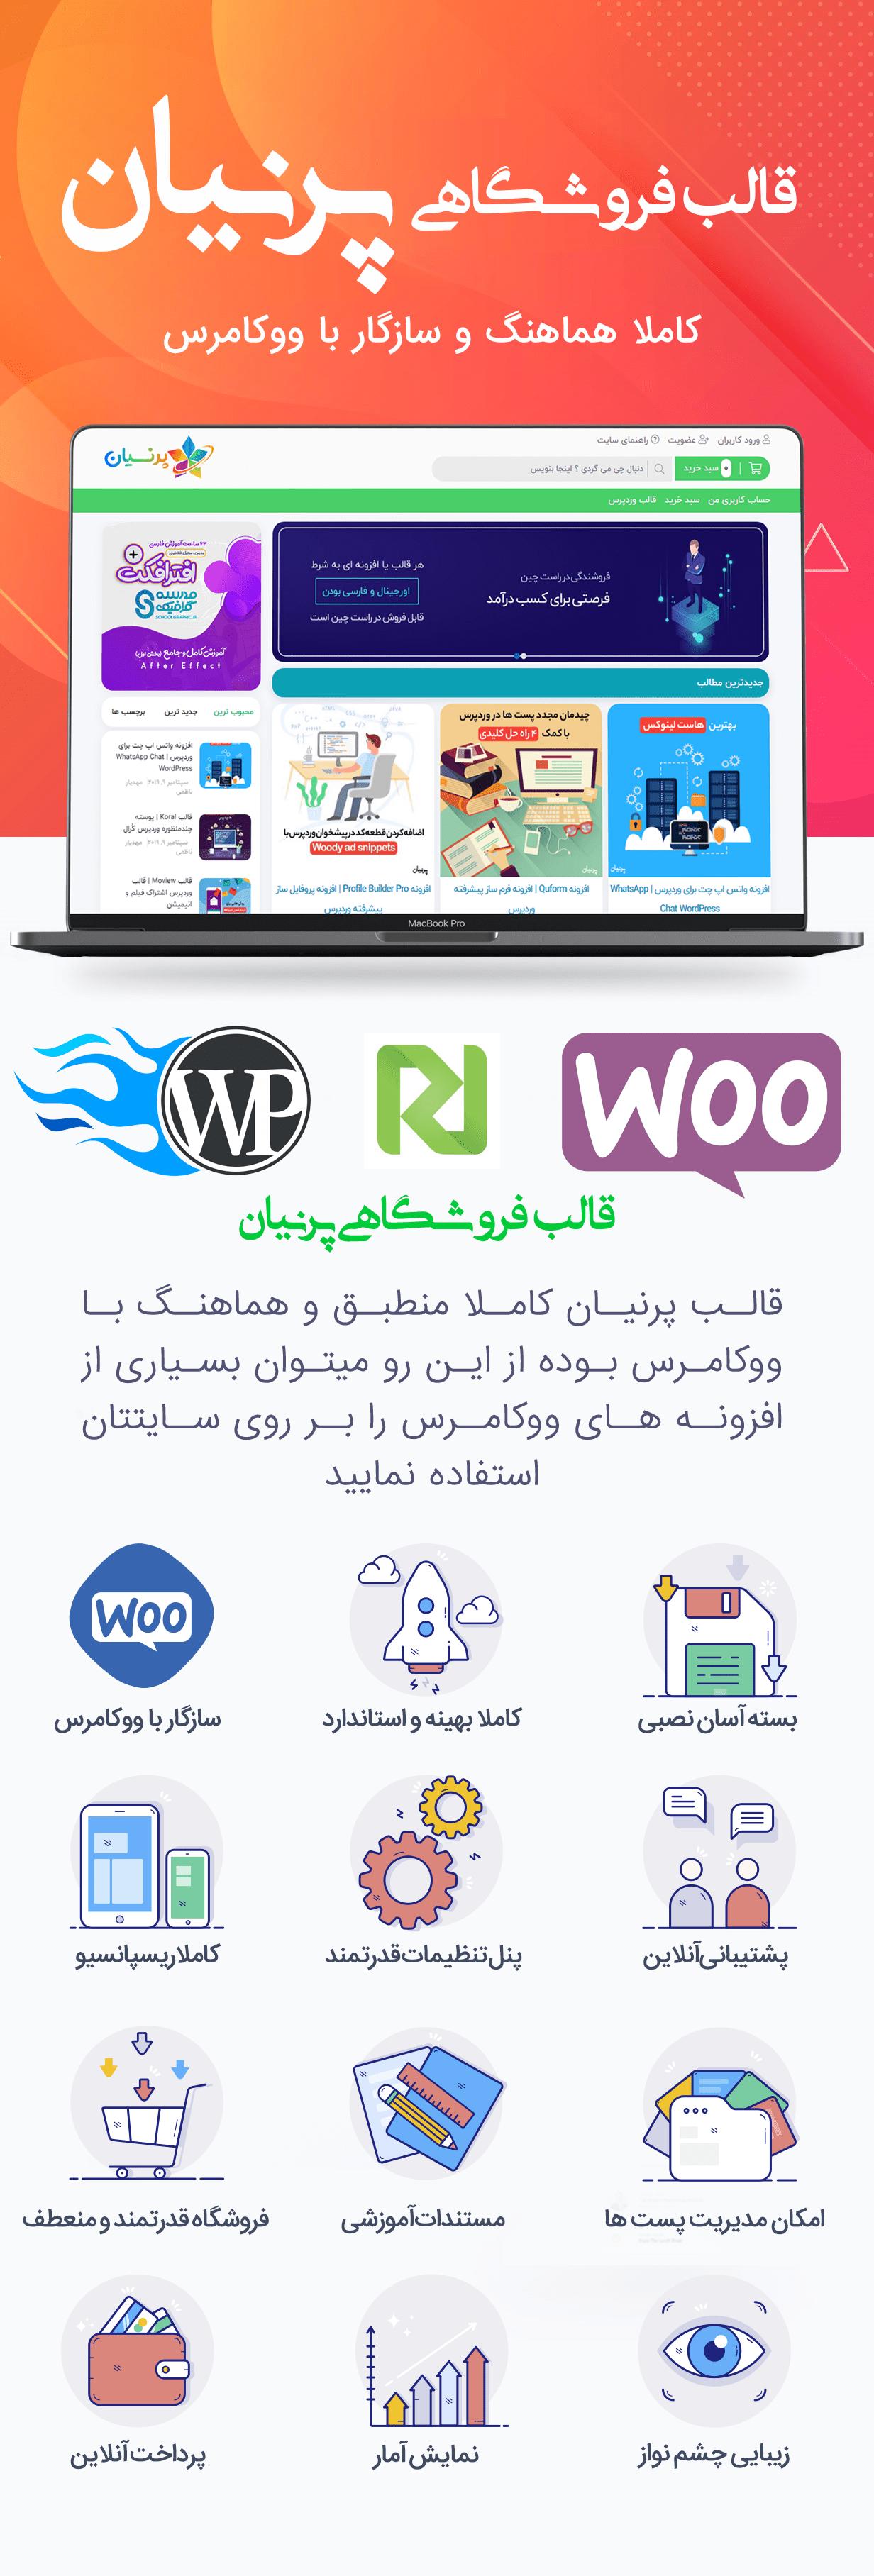 74306 cec552f5a117fee54a07f15fb - قالب فروشگاهی وردپرس ایرانی پرنیان